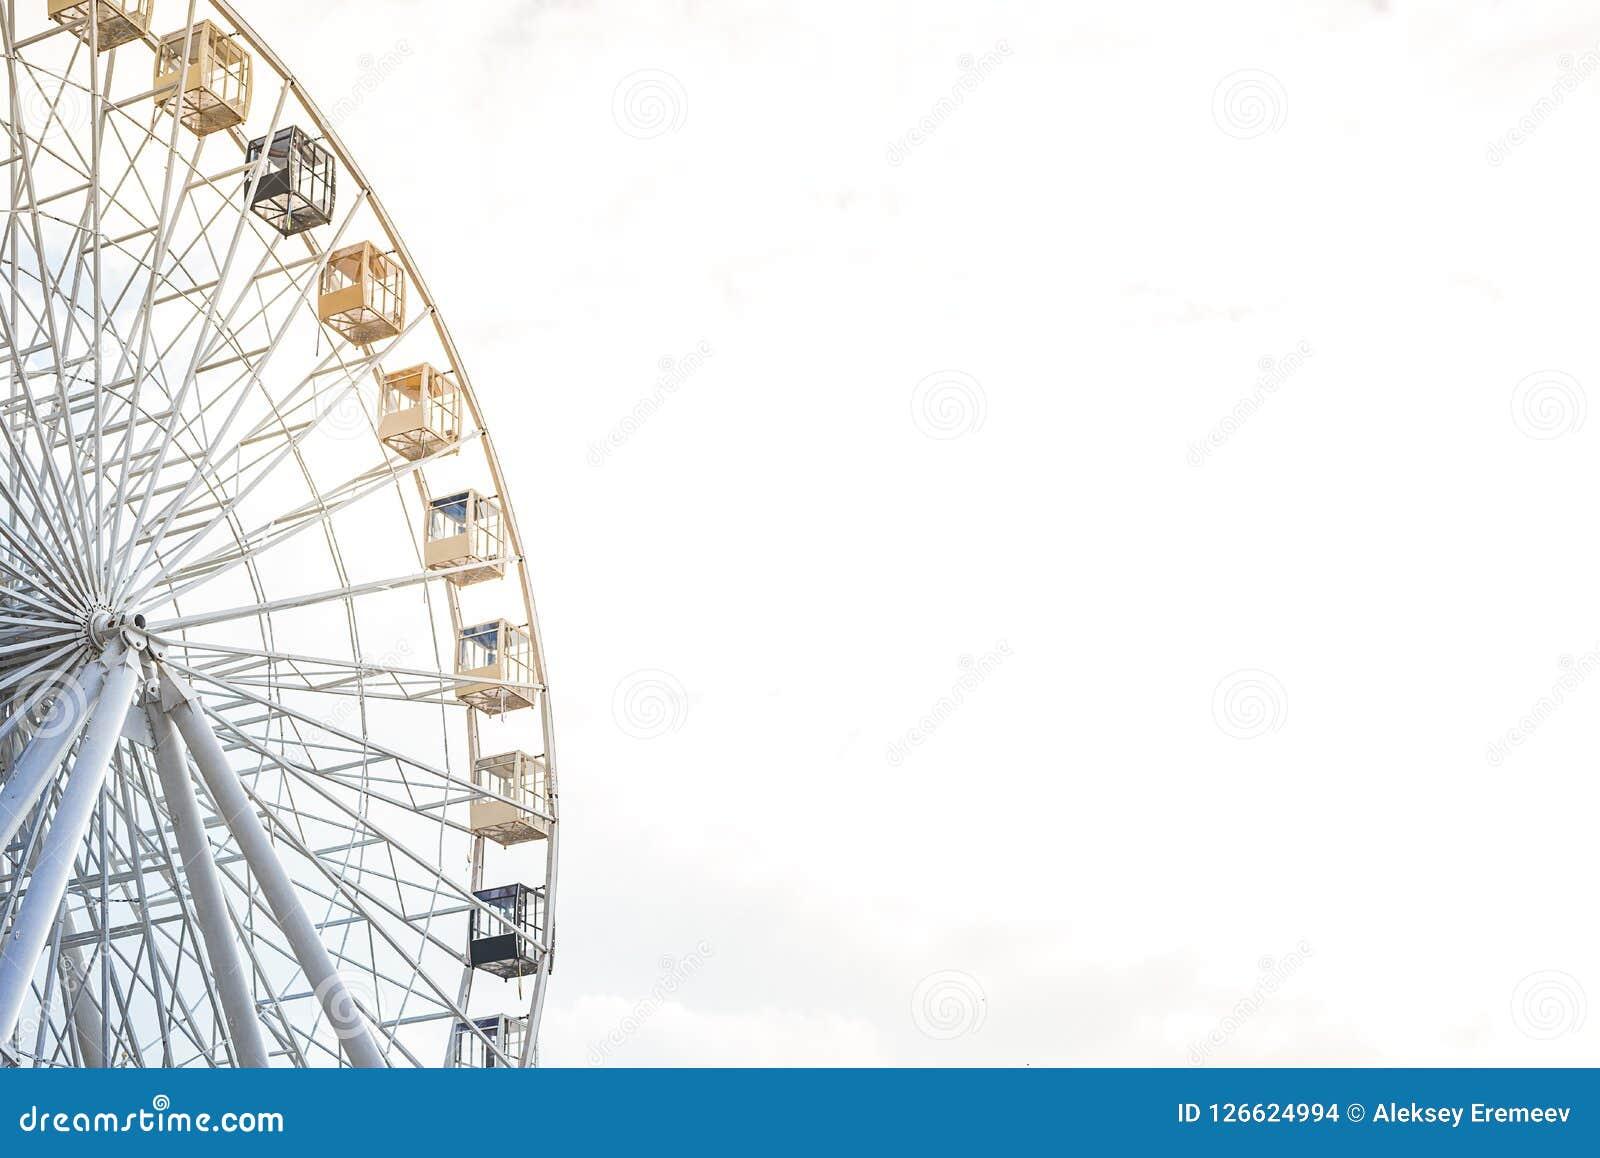 Big Ferris Wheel Against The Sky Stock Photo - Image of decorative ...